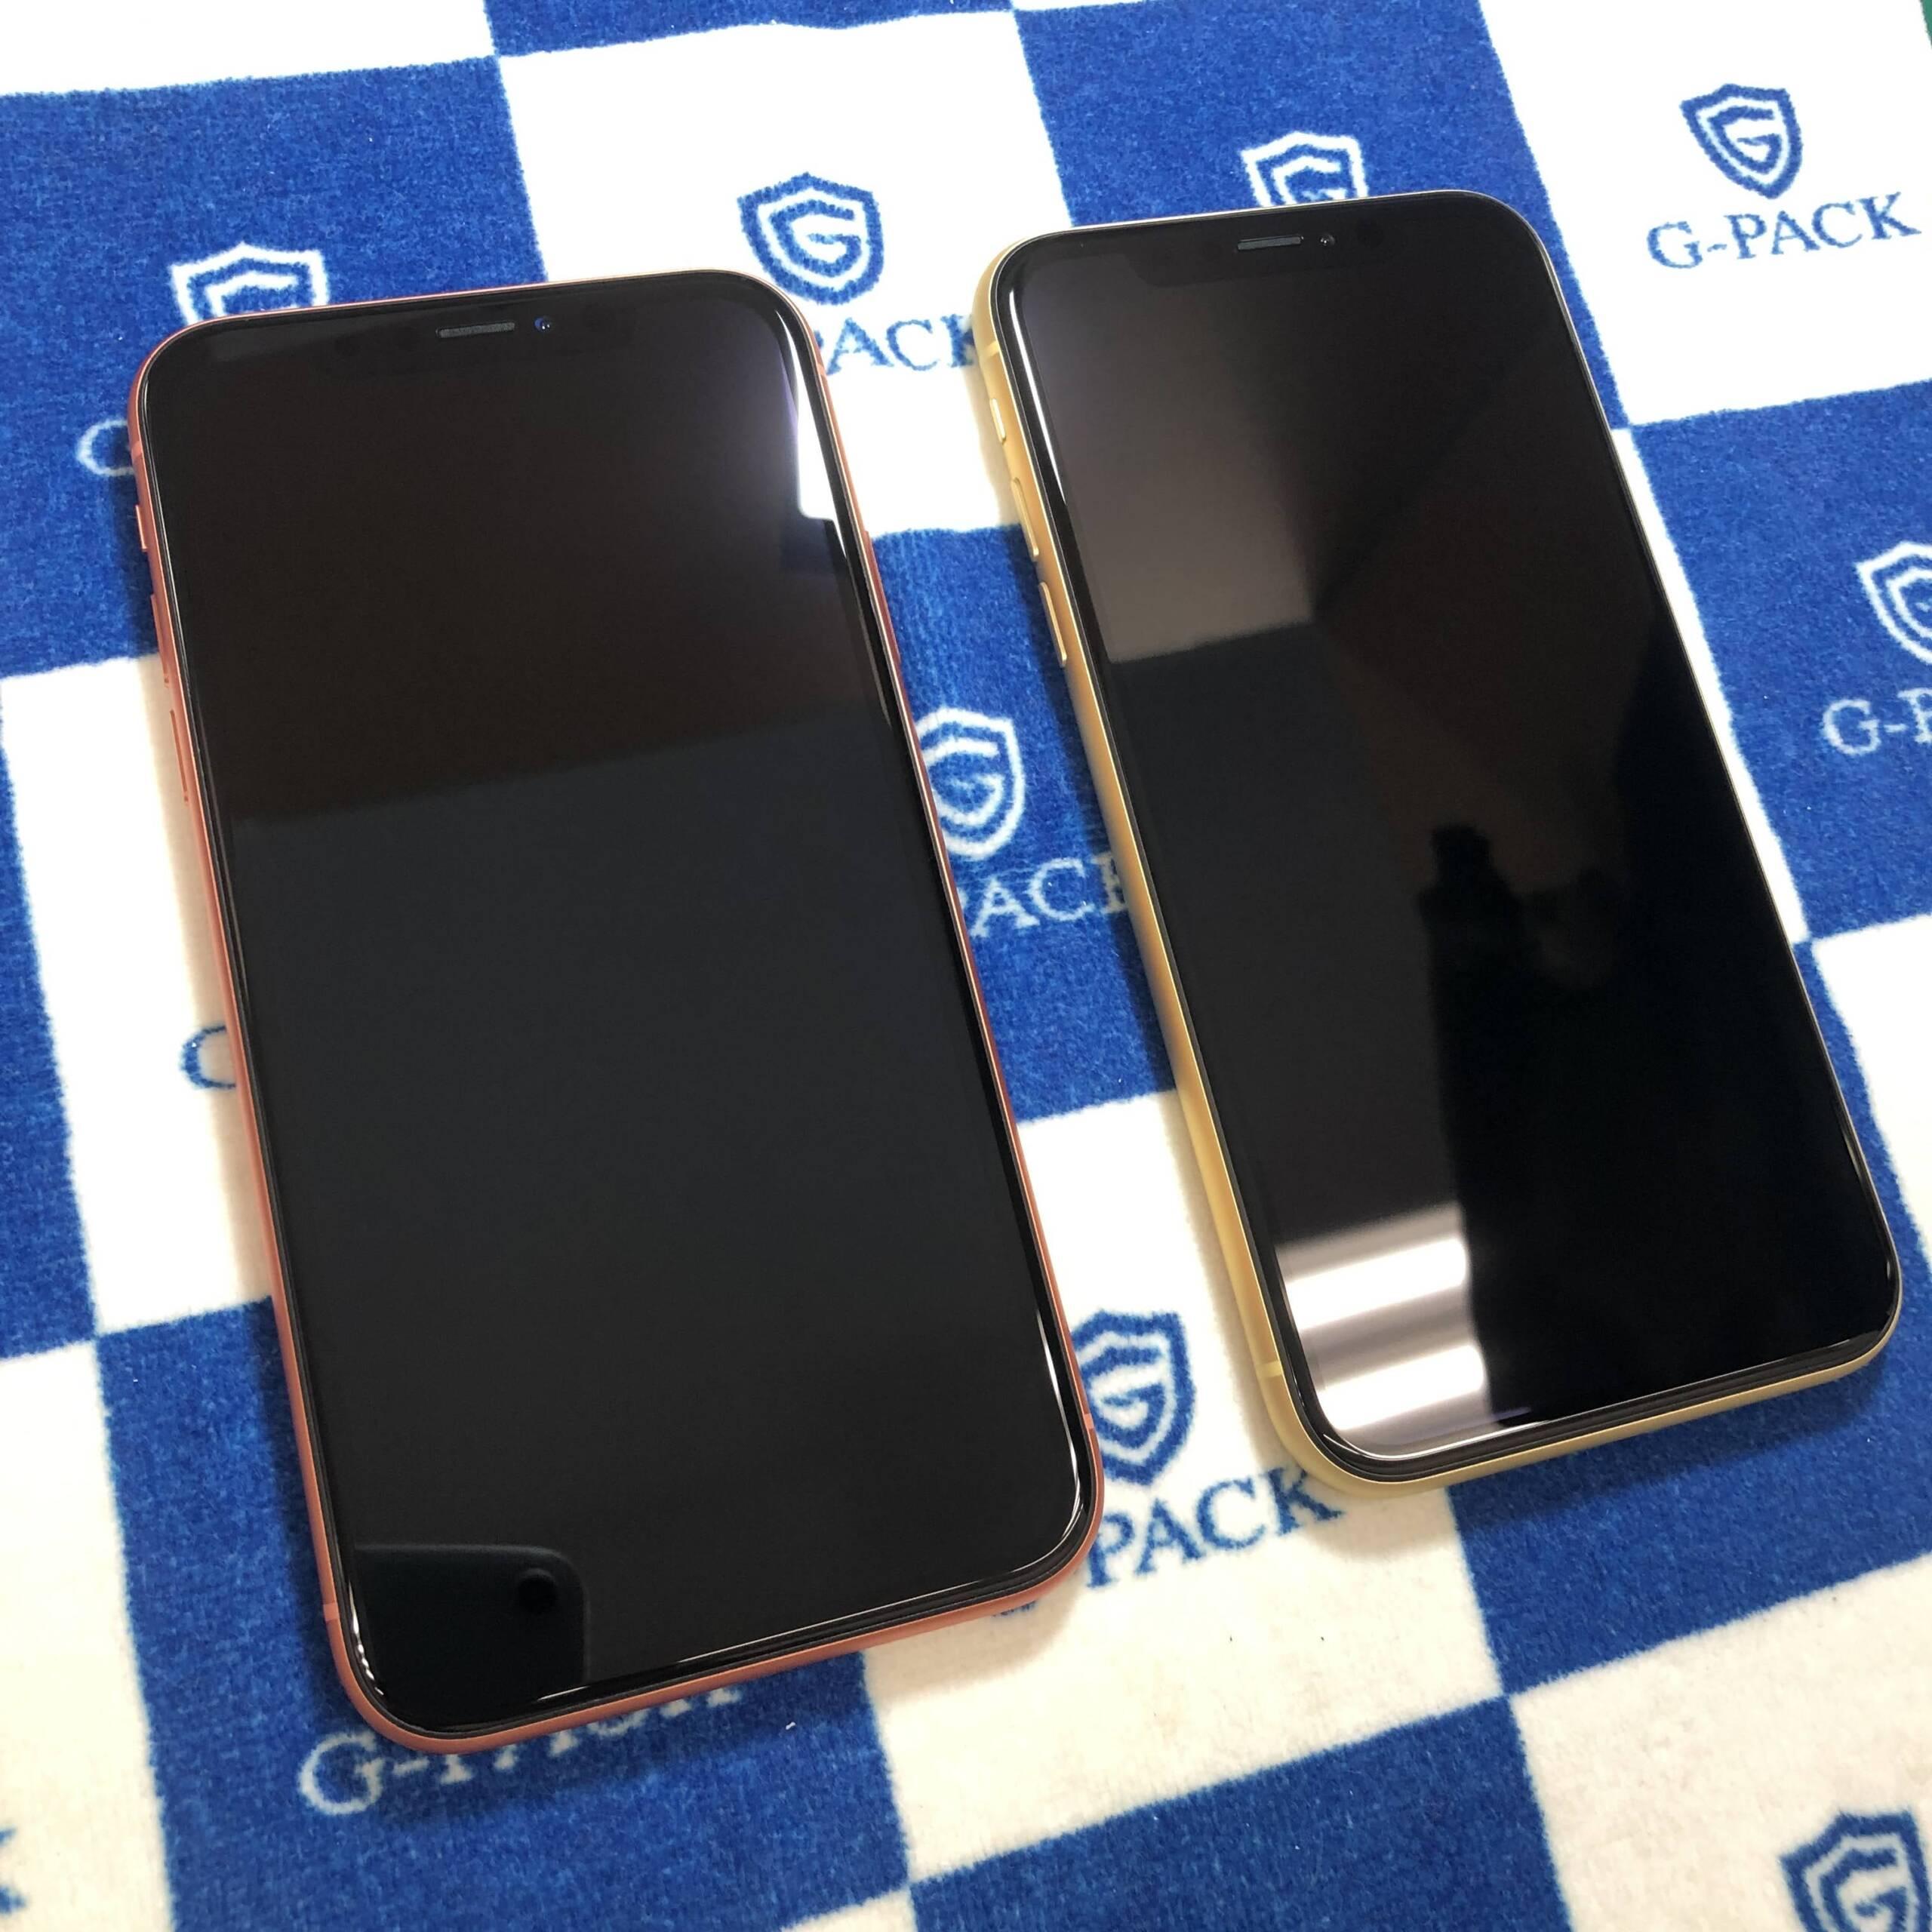 iPhoneへのガラスコーティング抗菌G-PACK